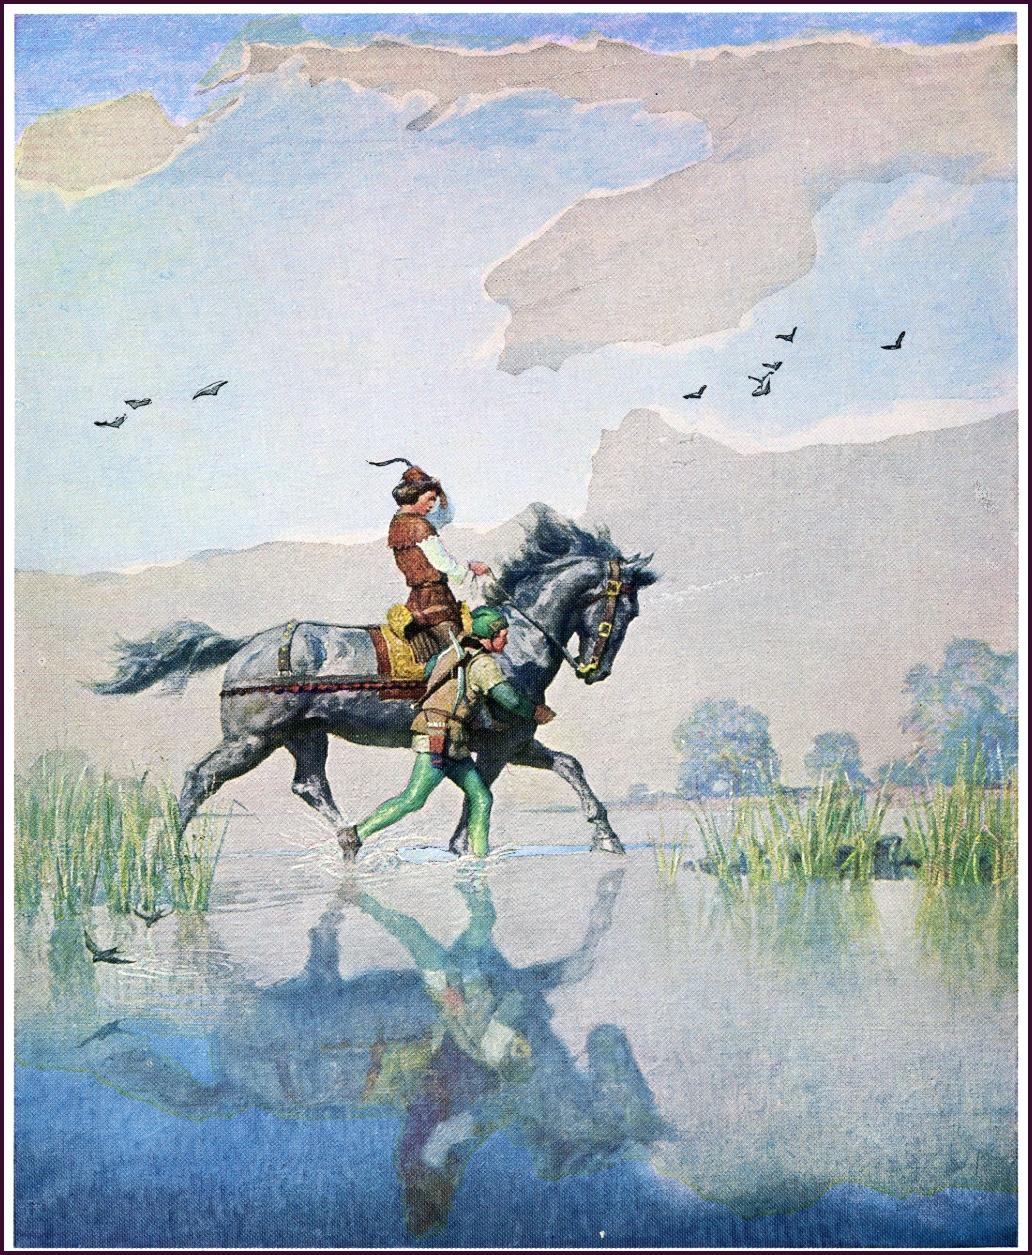 N C Wyeth Illustrations 1933 The Black Arrow Robert Louis